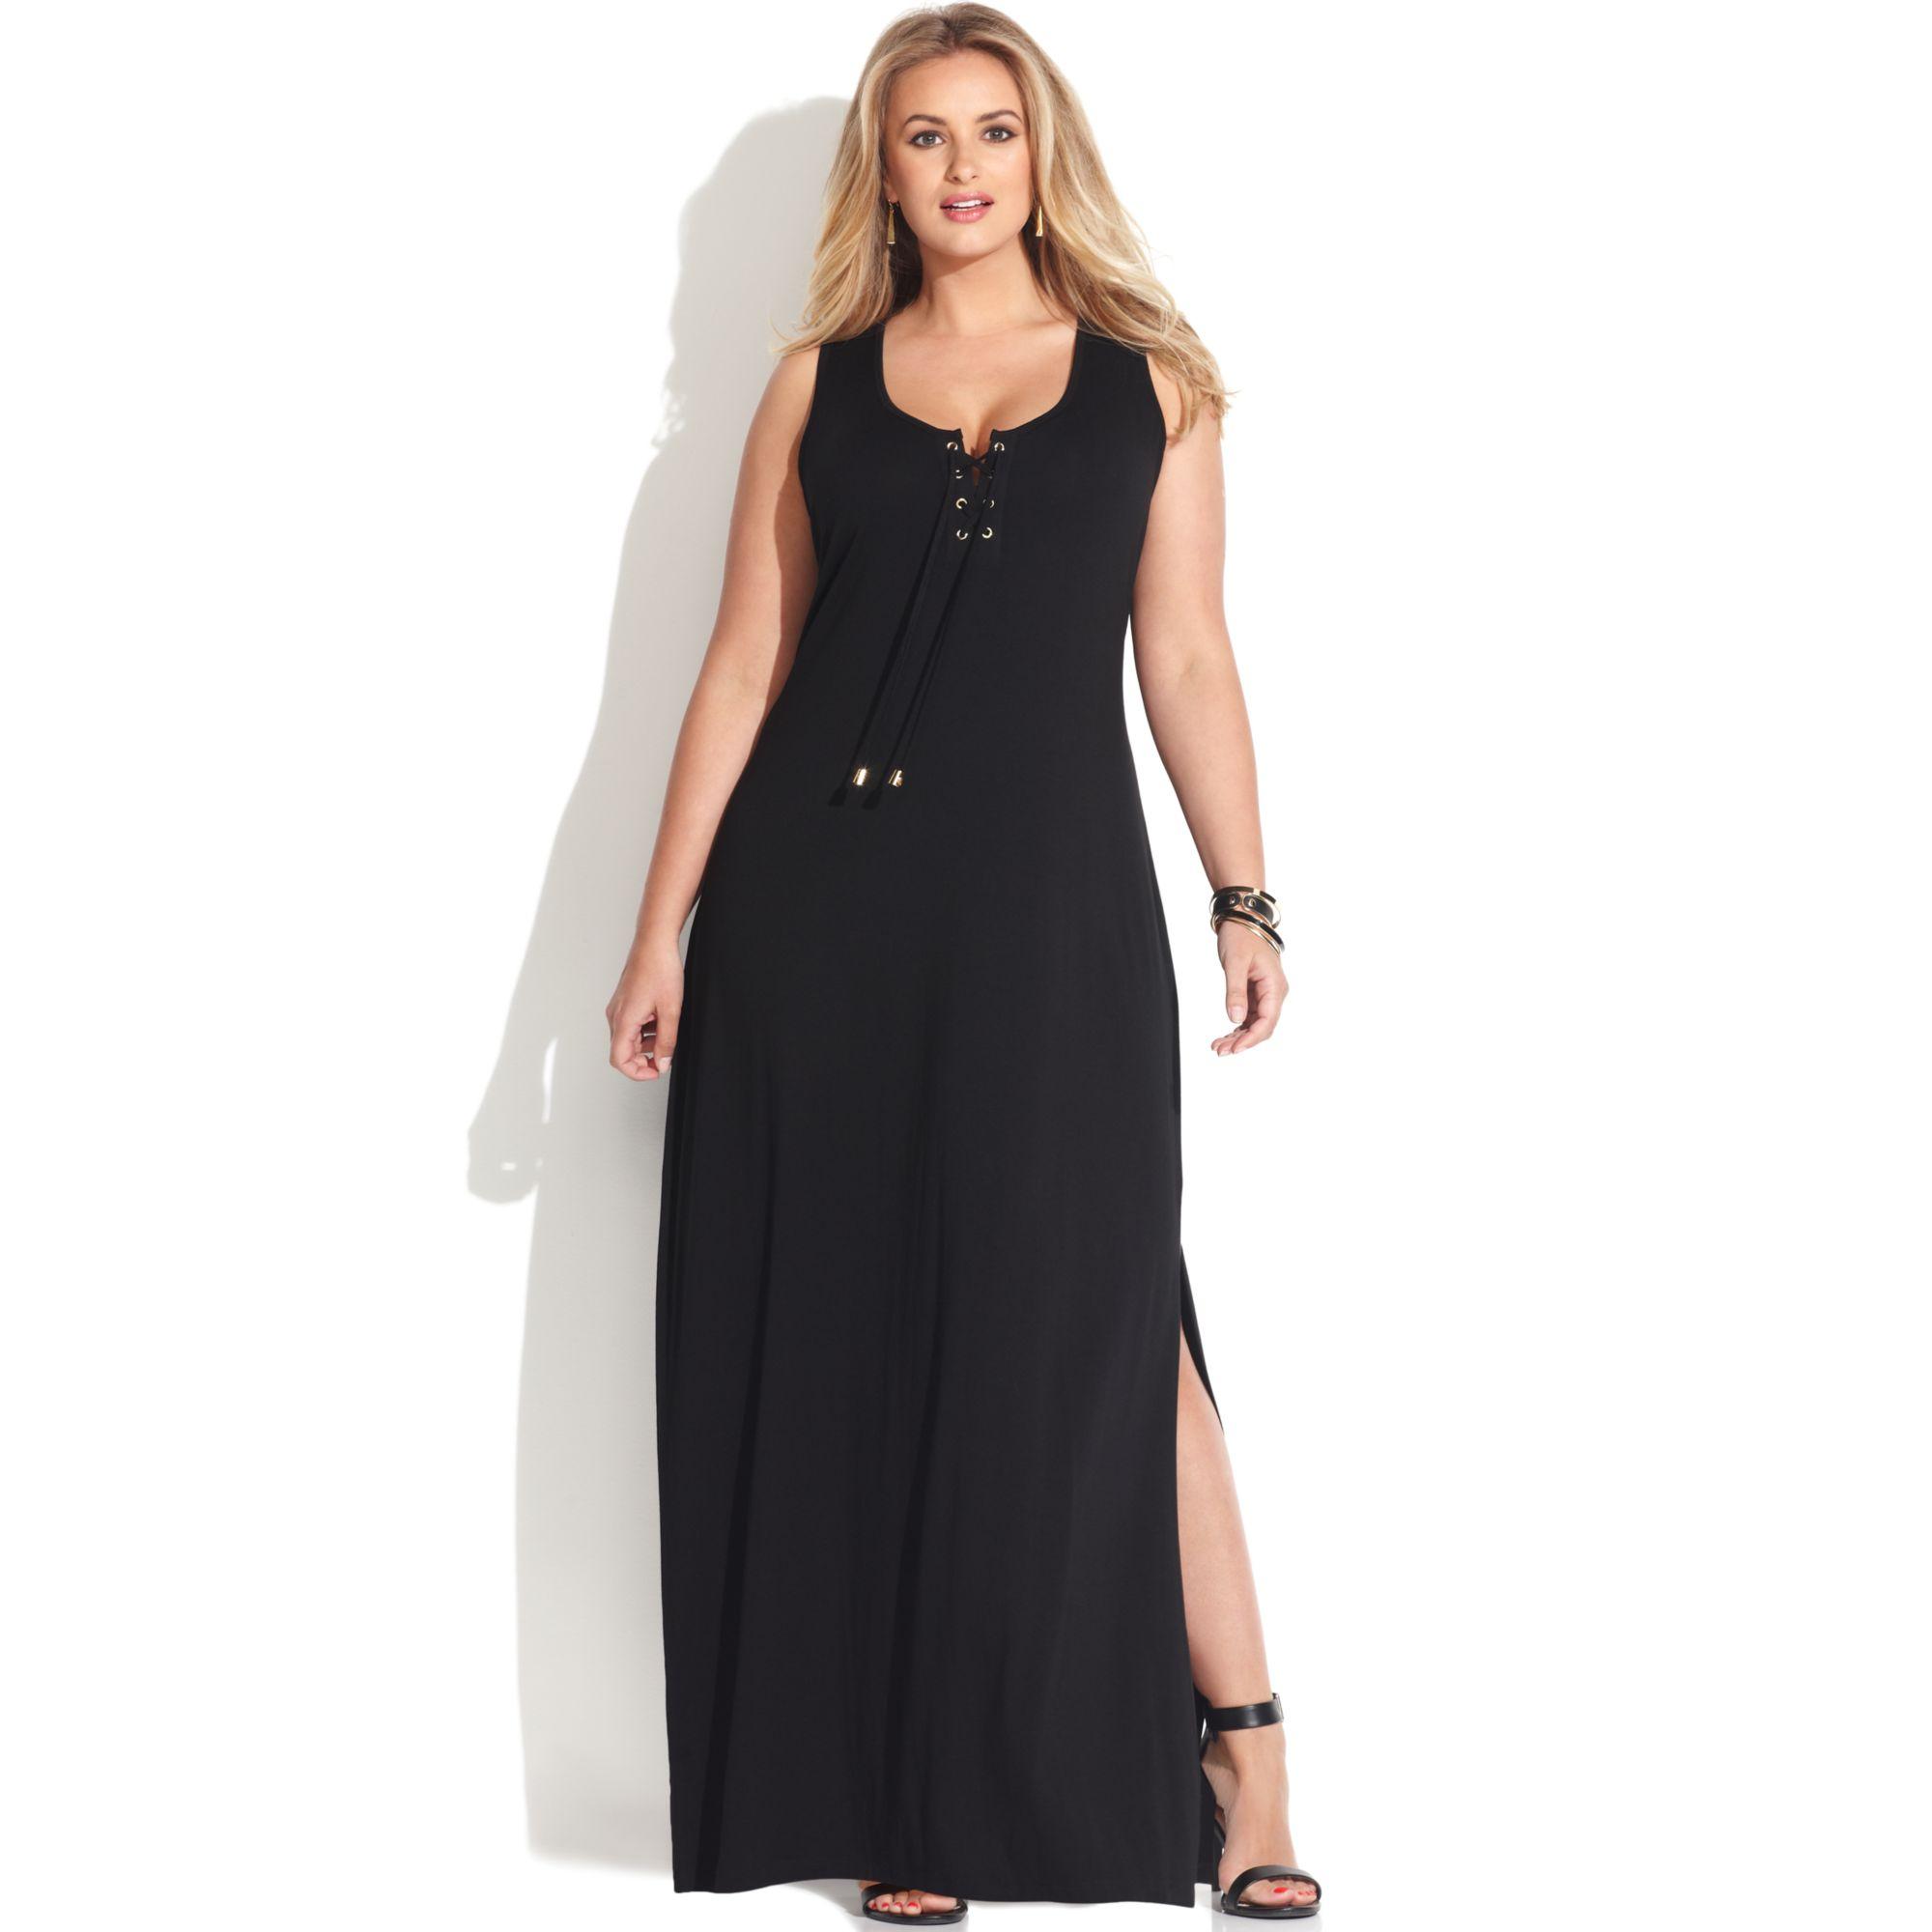 Plus Size Sleeveless Lace Up Maxi Dress